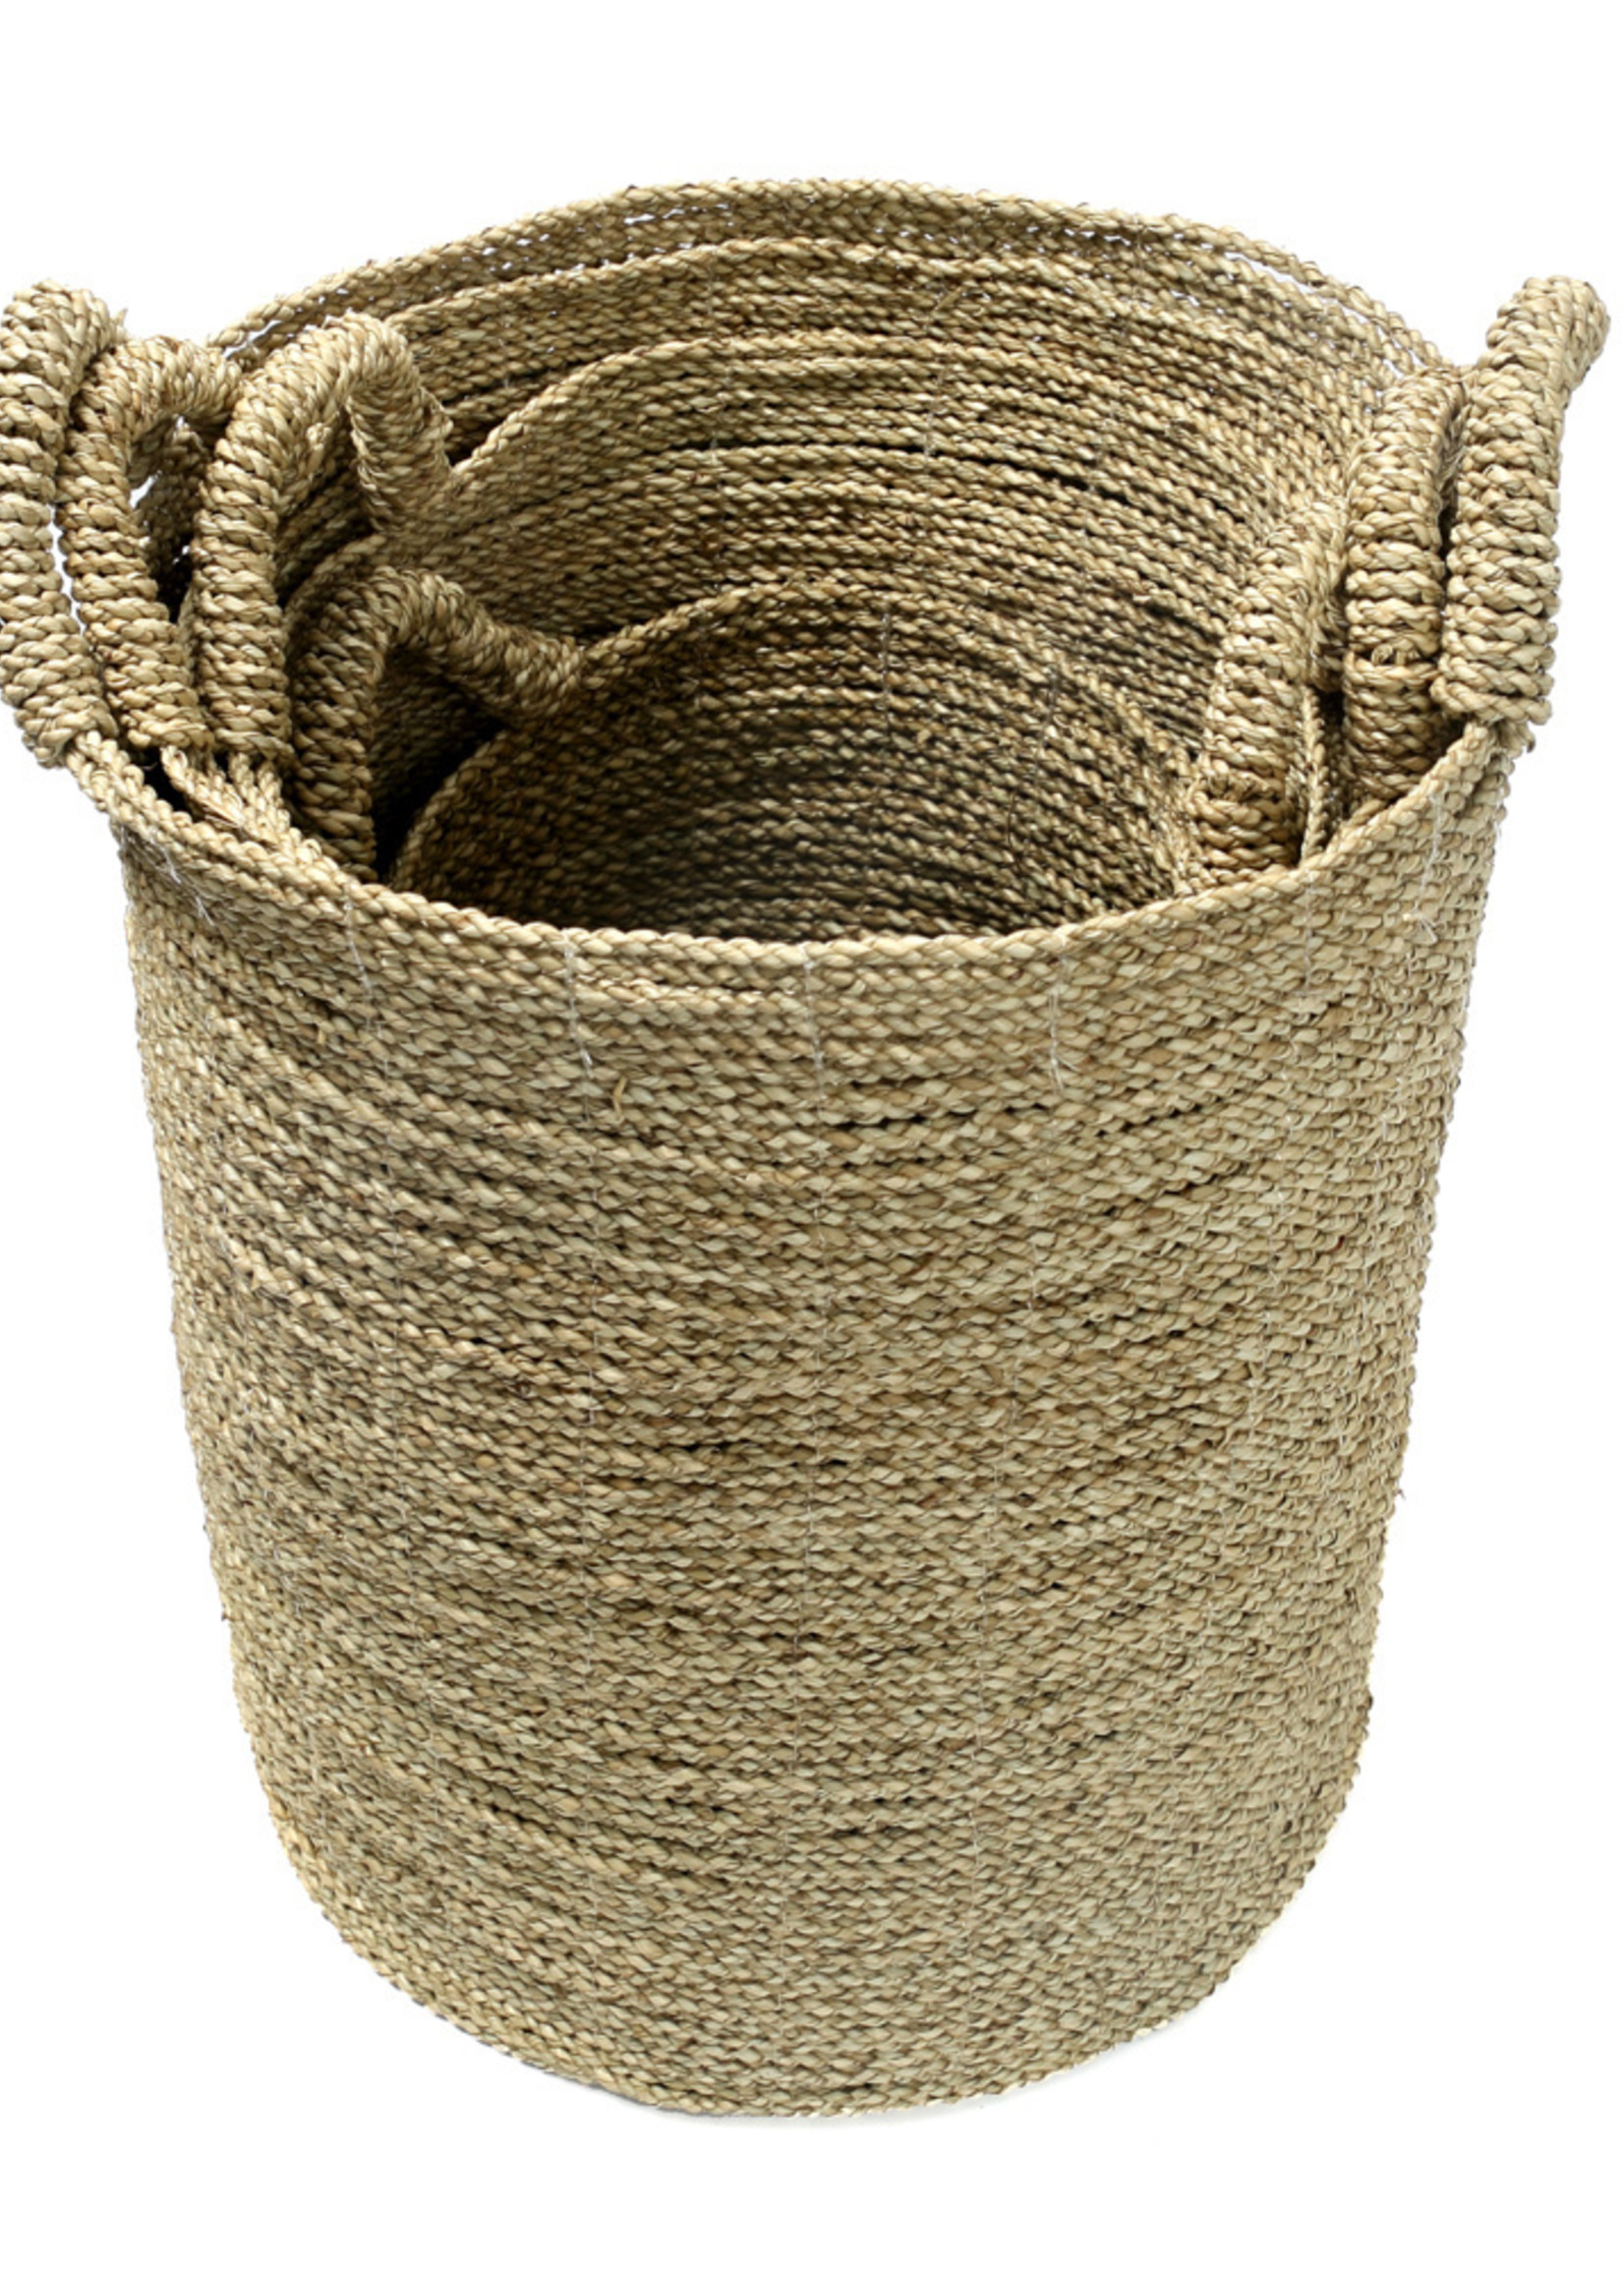 The Sensity Baskets - Natural - Set 4